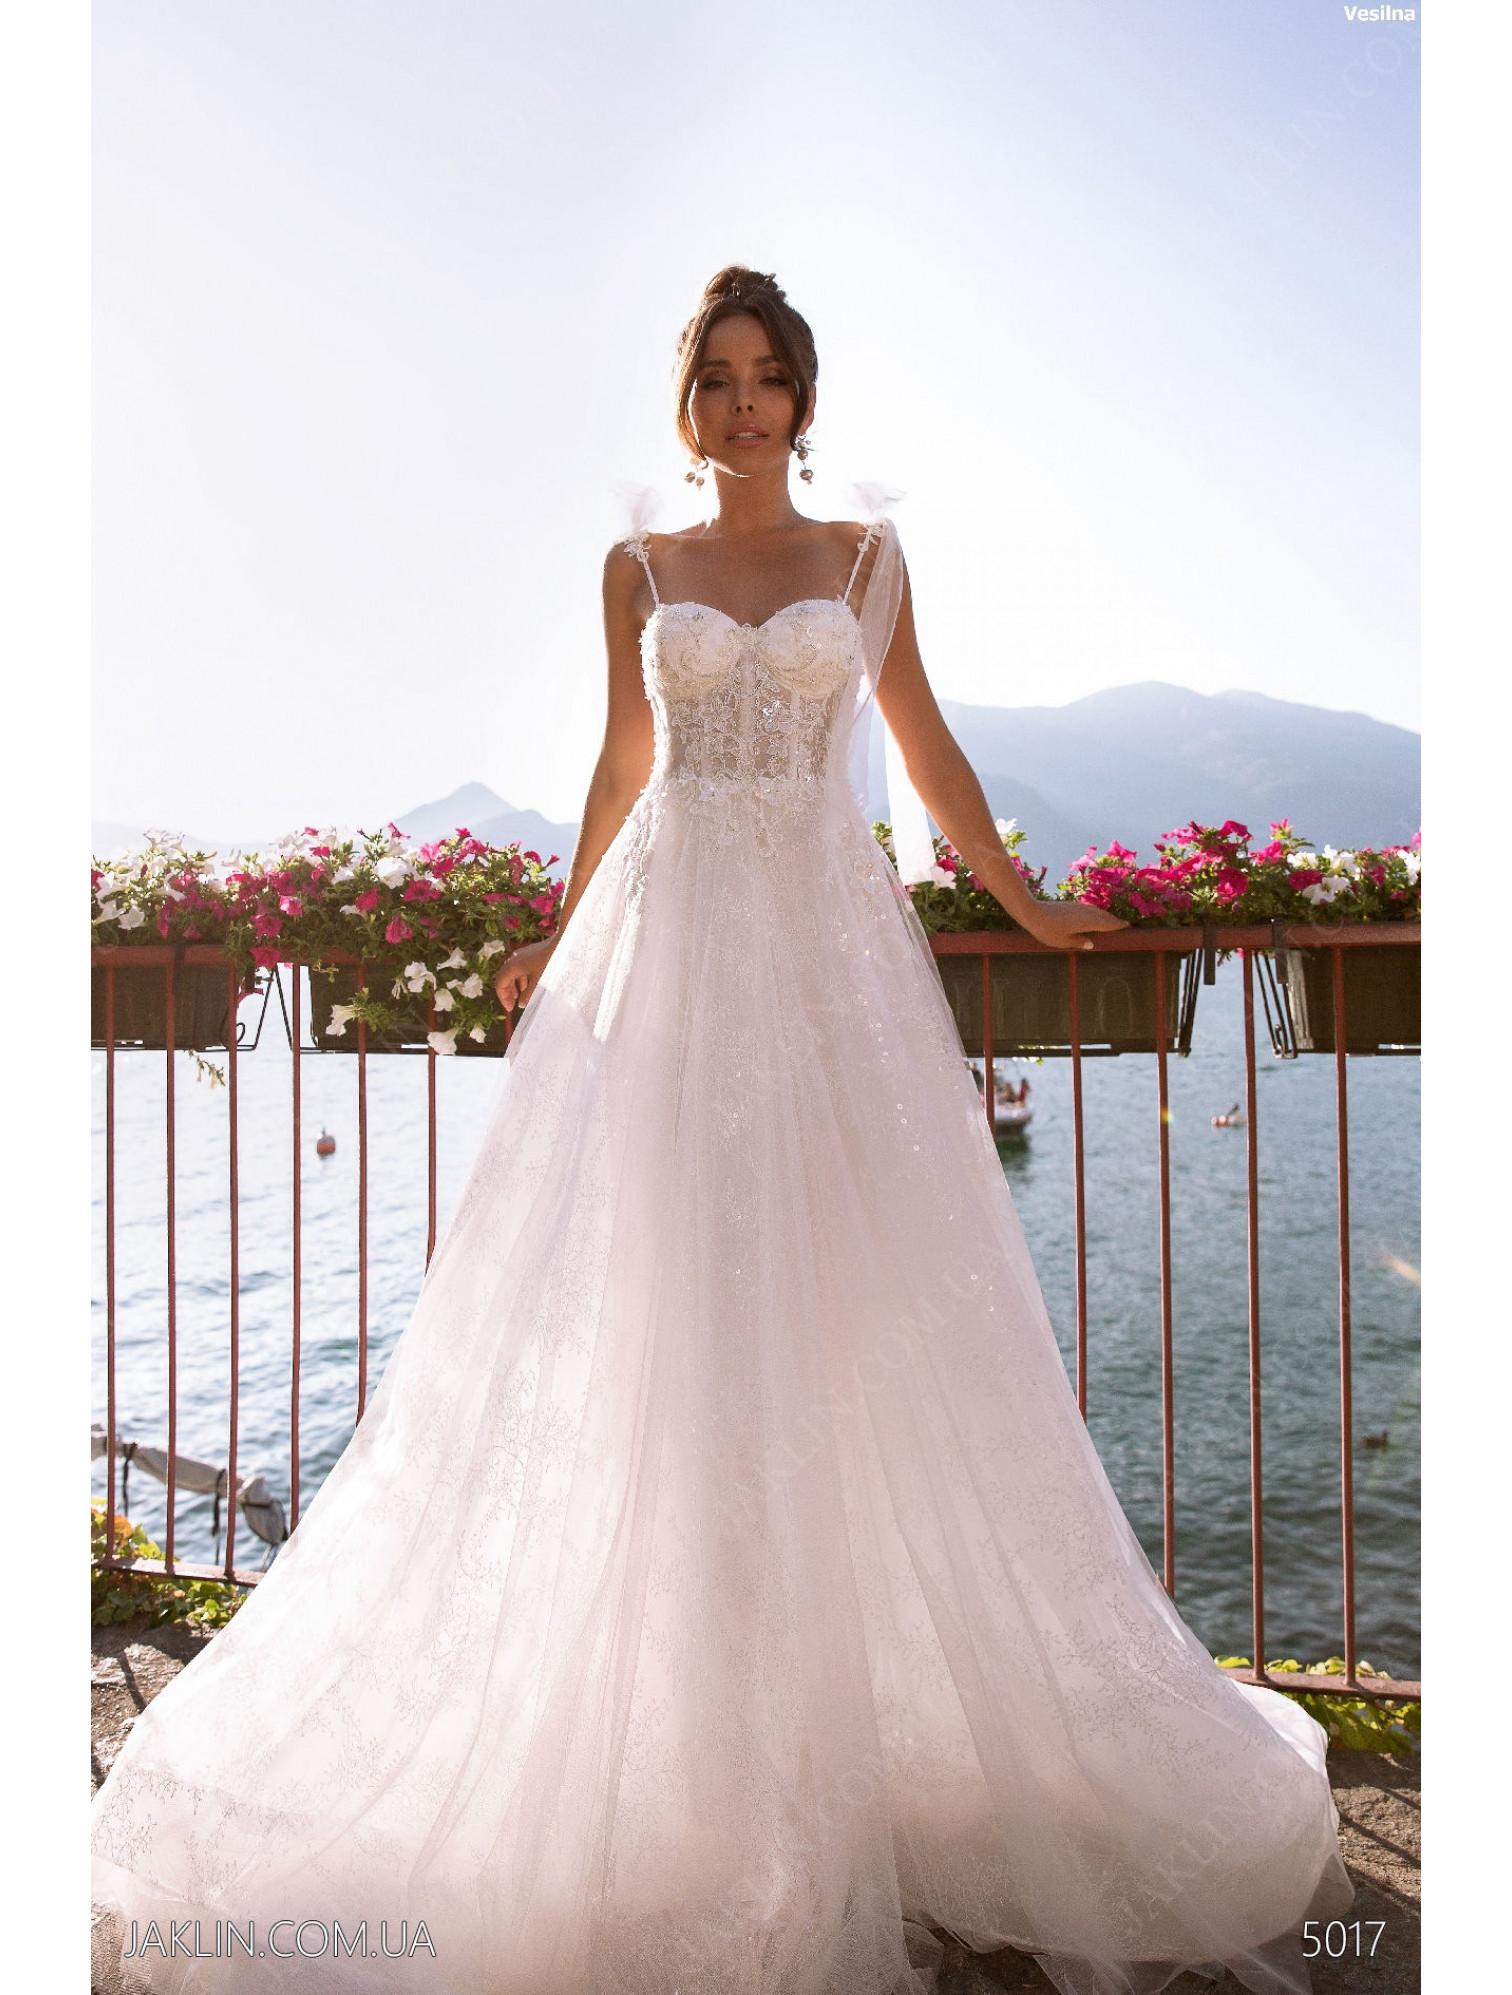 Wedding dress 5017